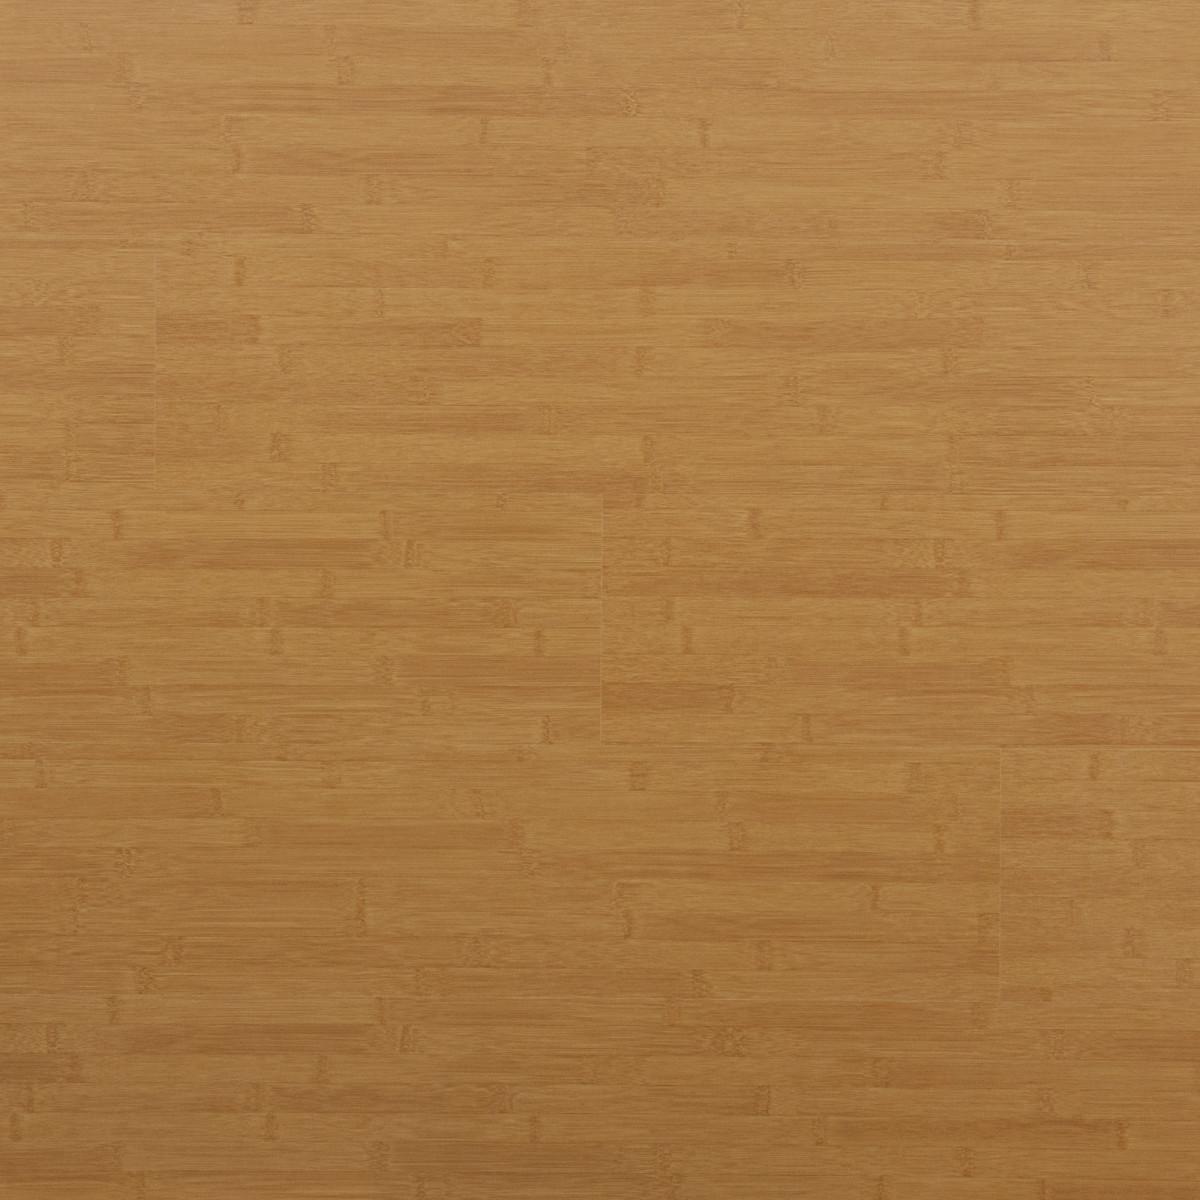 Ламинат Бамбук светлый KR 32 класс толщина 8 мм 2.131 м2